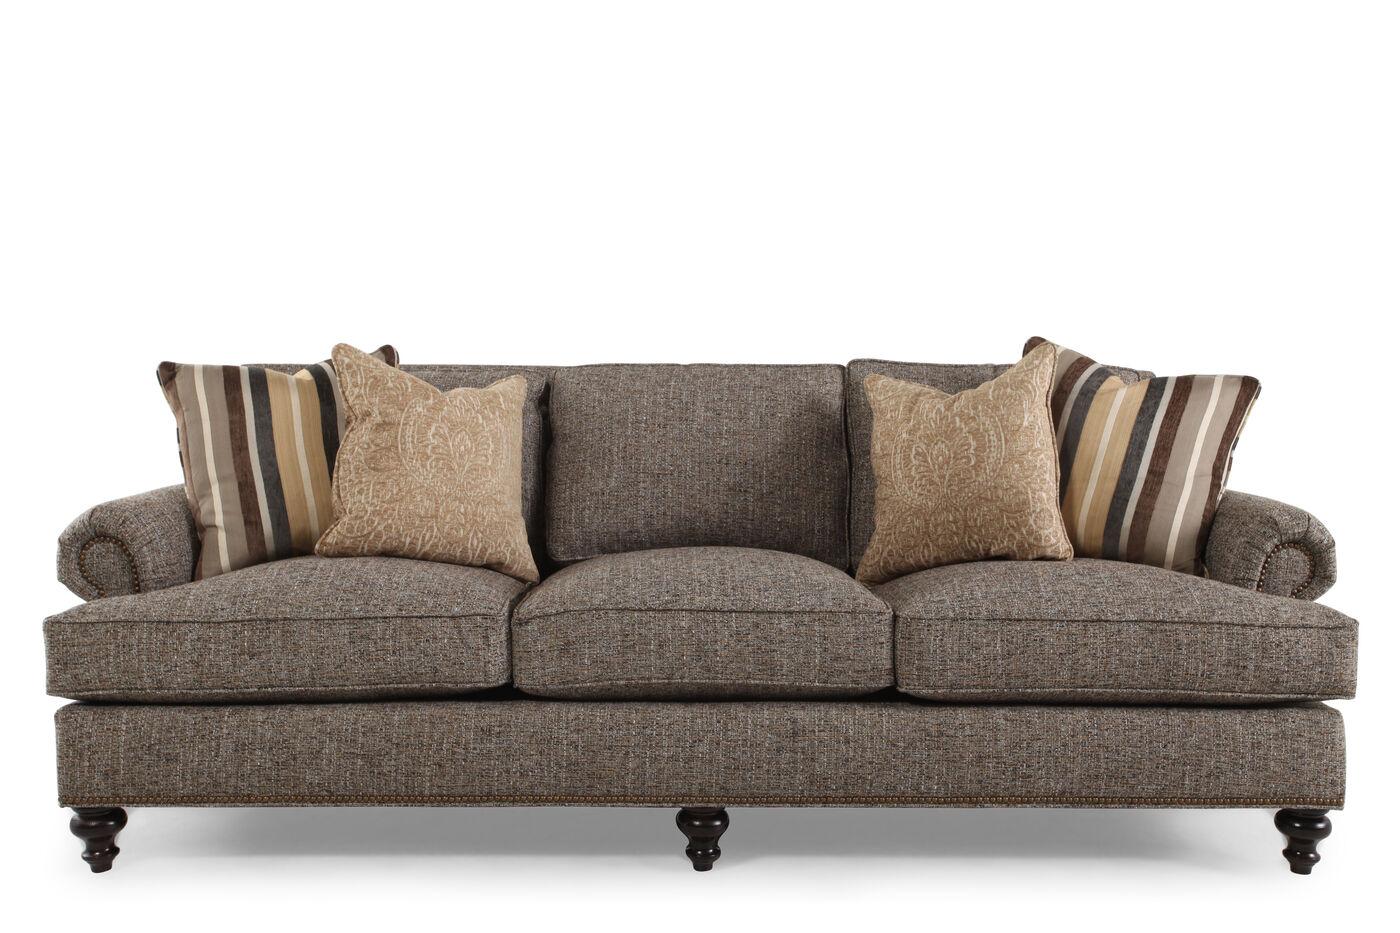 sam moore sofa sam moore living room crawford 3 over sofa. Black Bedroom Furniture Sets. Home Design Ideas